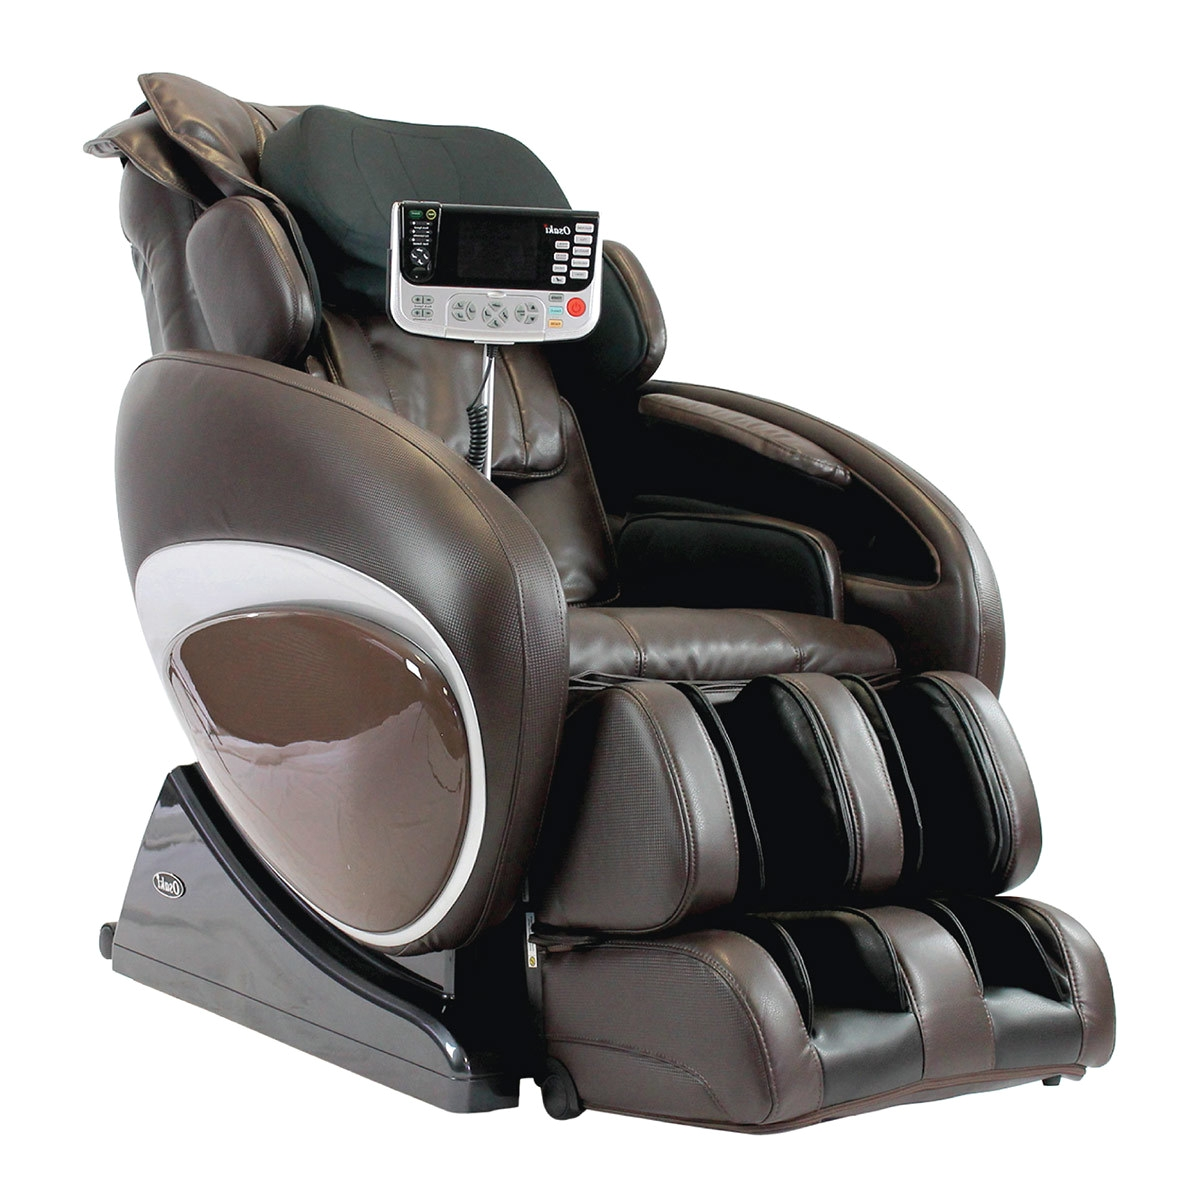 Health Centre Mini Massage Chair Cost Osaki Os 4000t Massage Chair Bed Planet